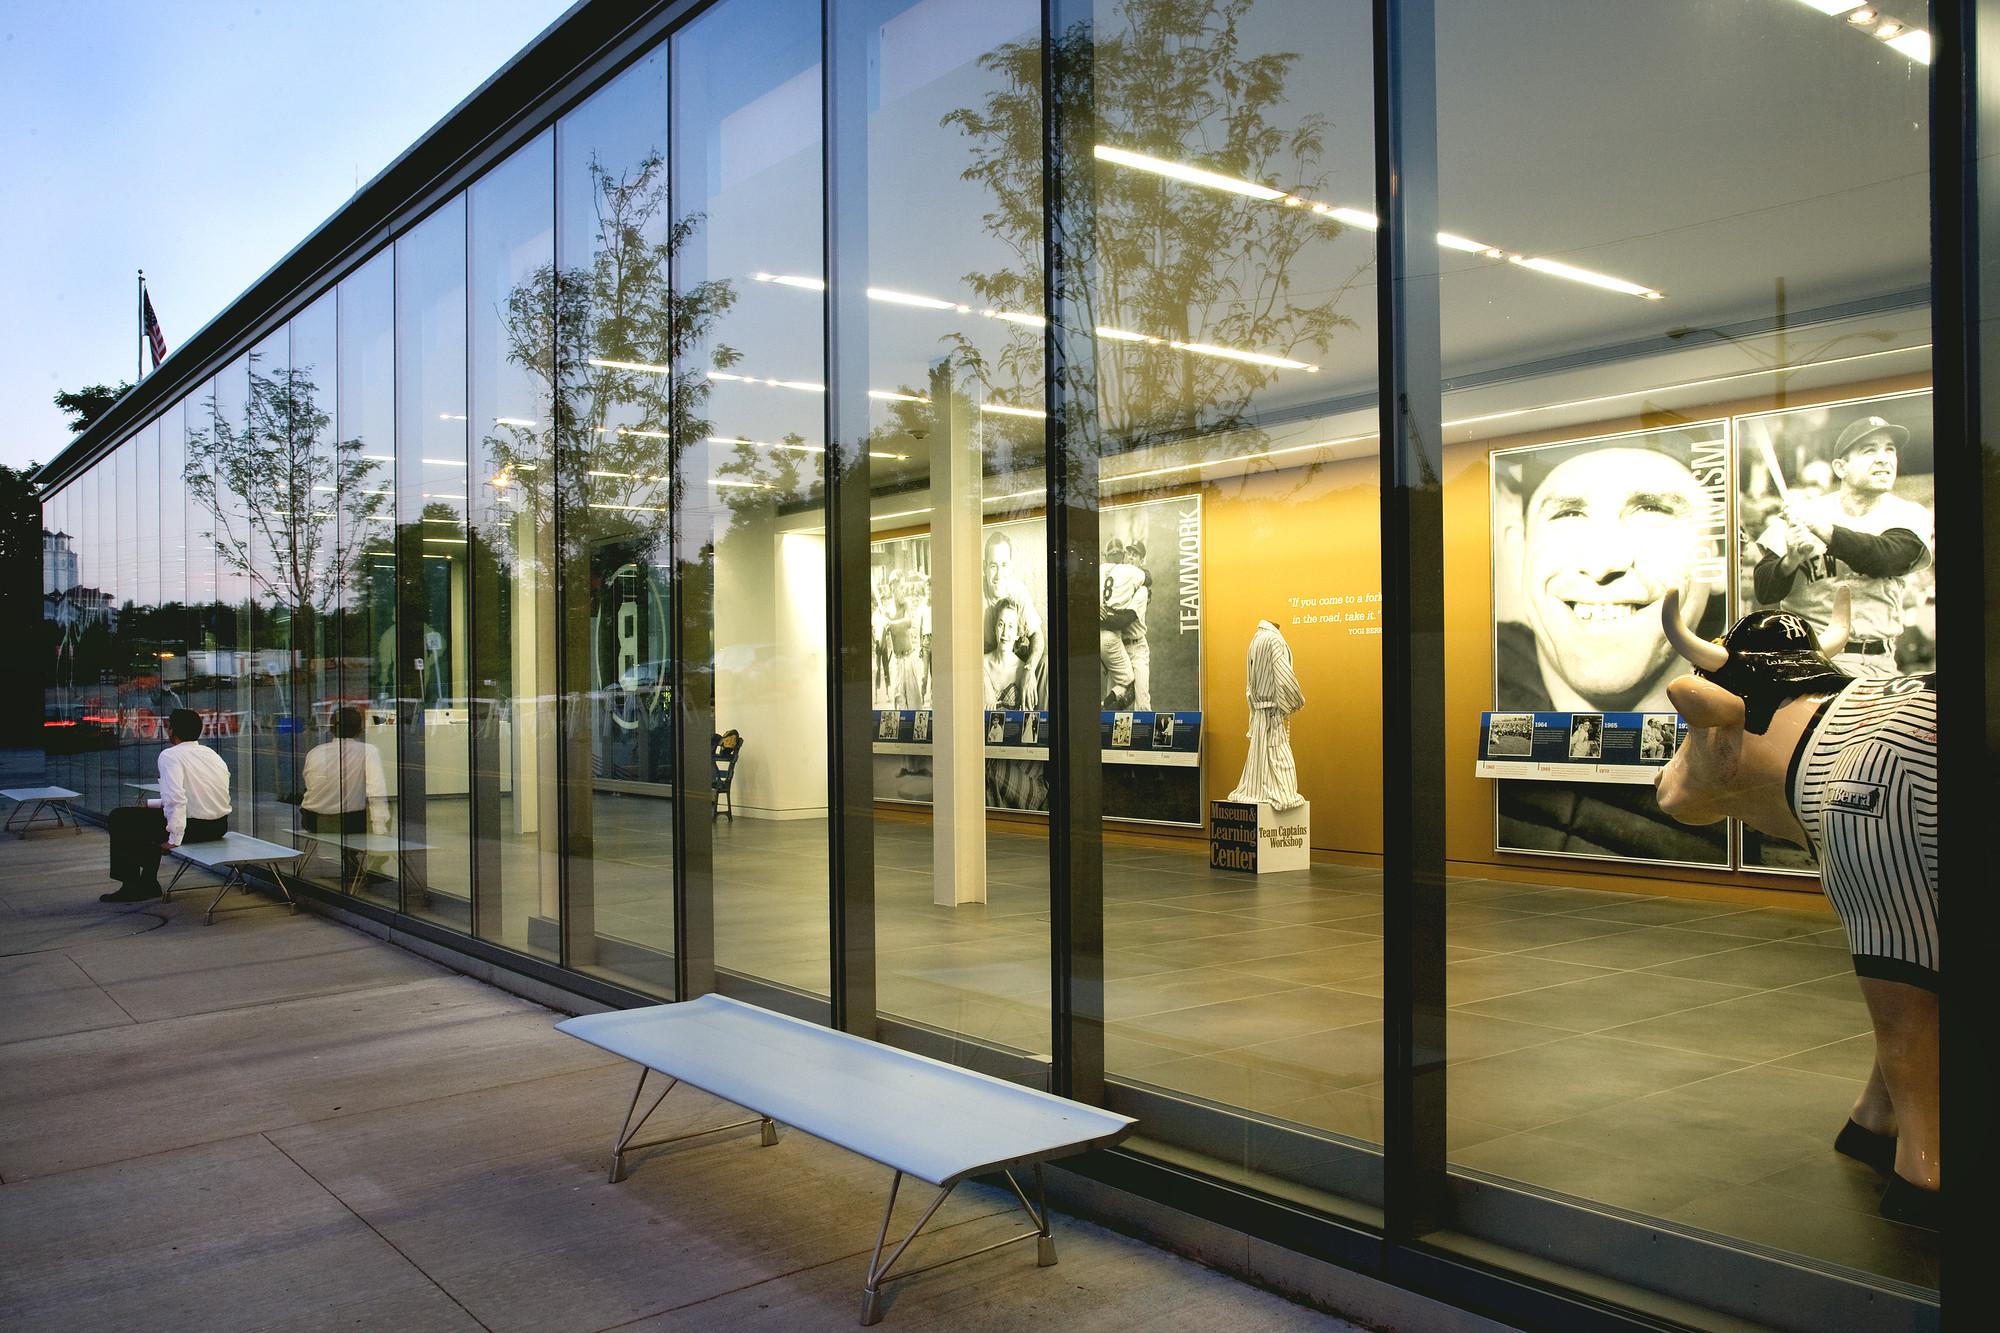 Yogi Berra Museum and Learning Center / ikon.5 architects